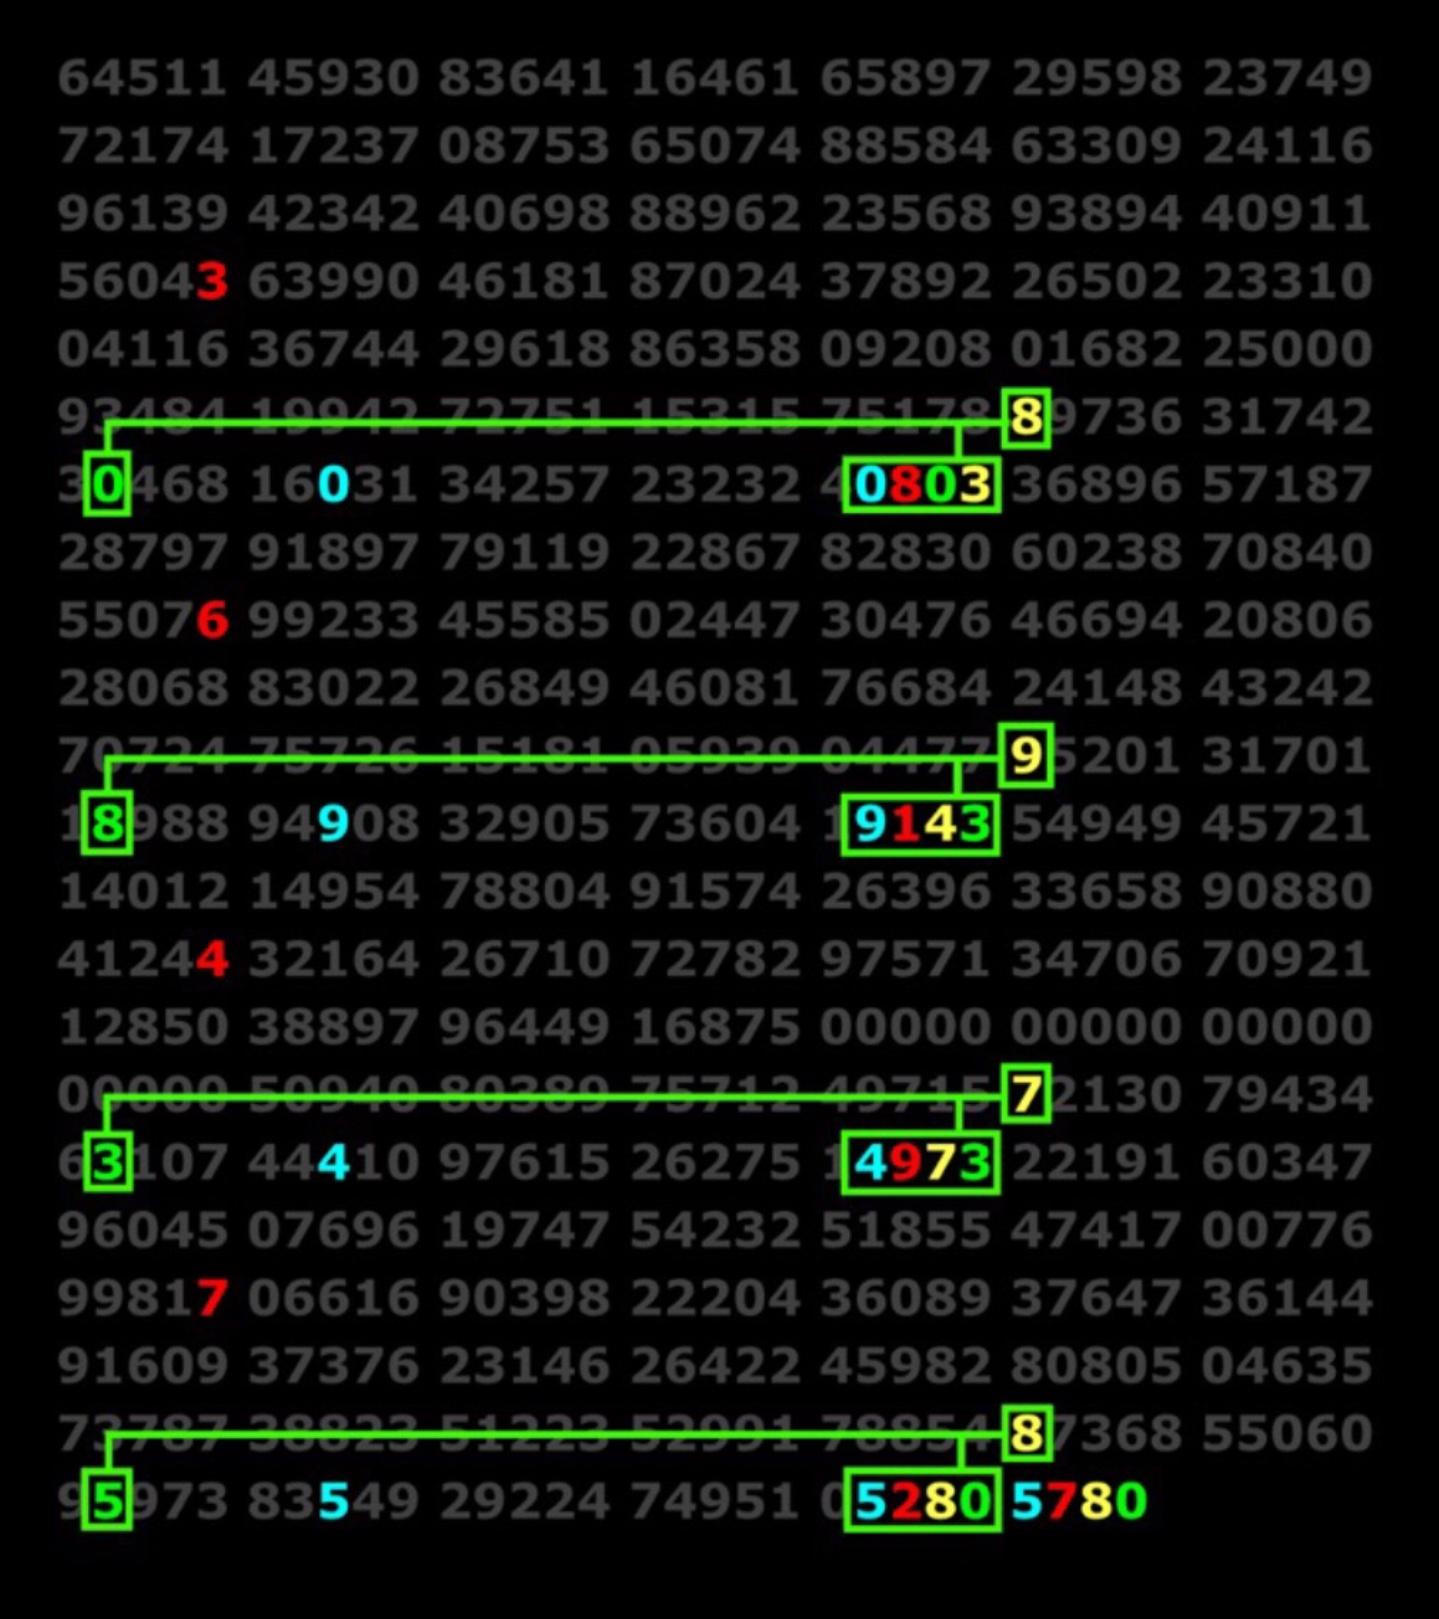 A89E074D-F60E-443C-BE5B-EE483D2095C5.jpeg